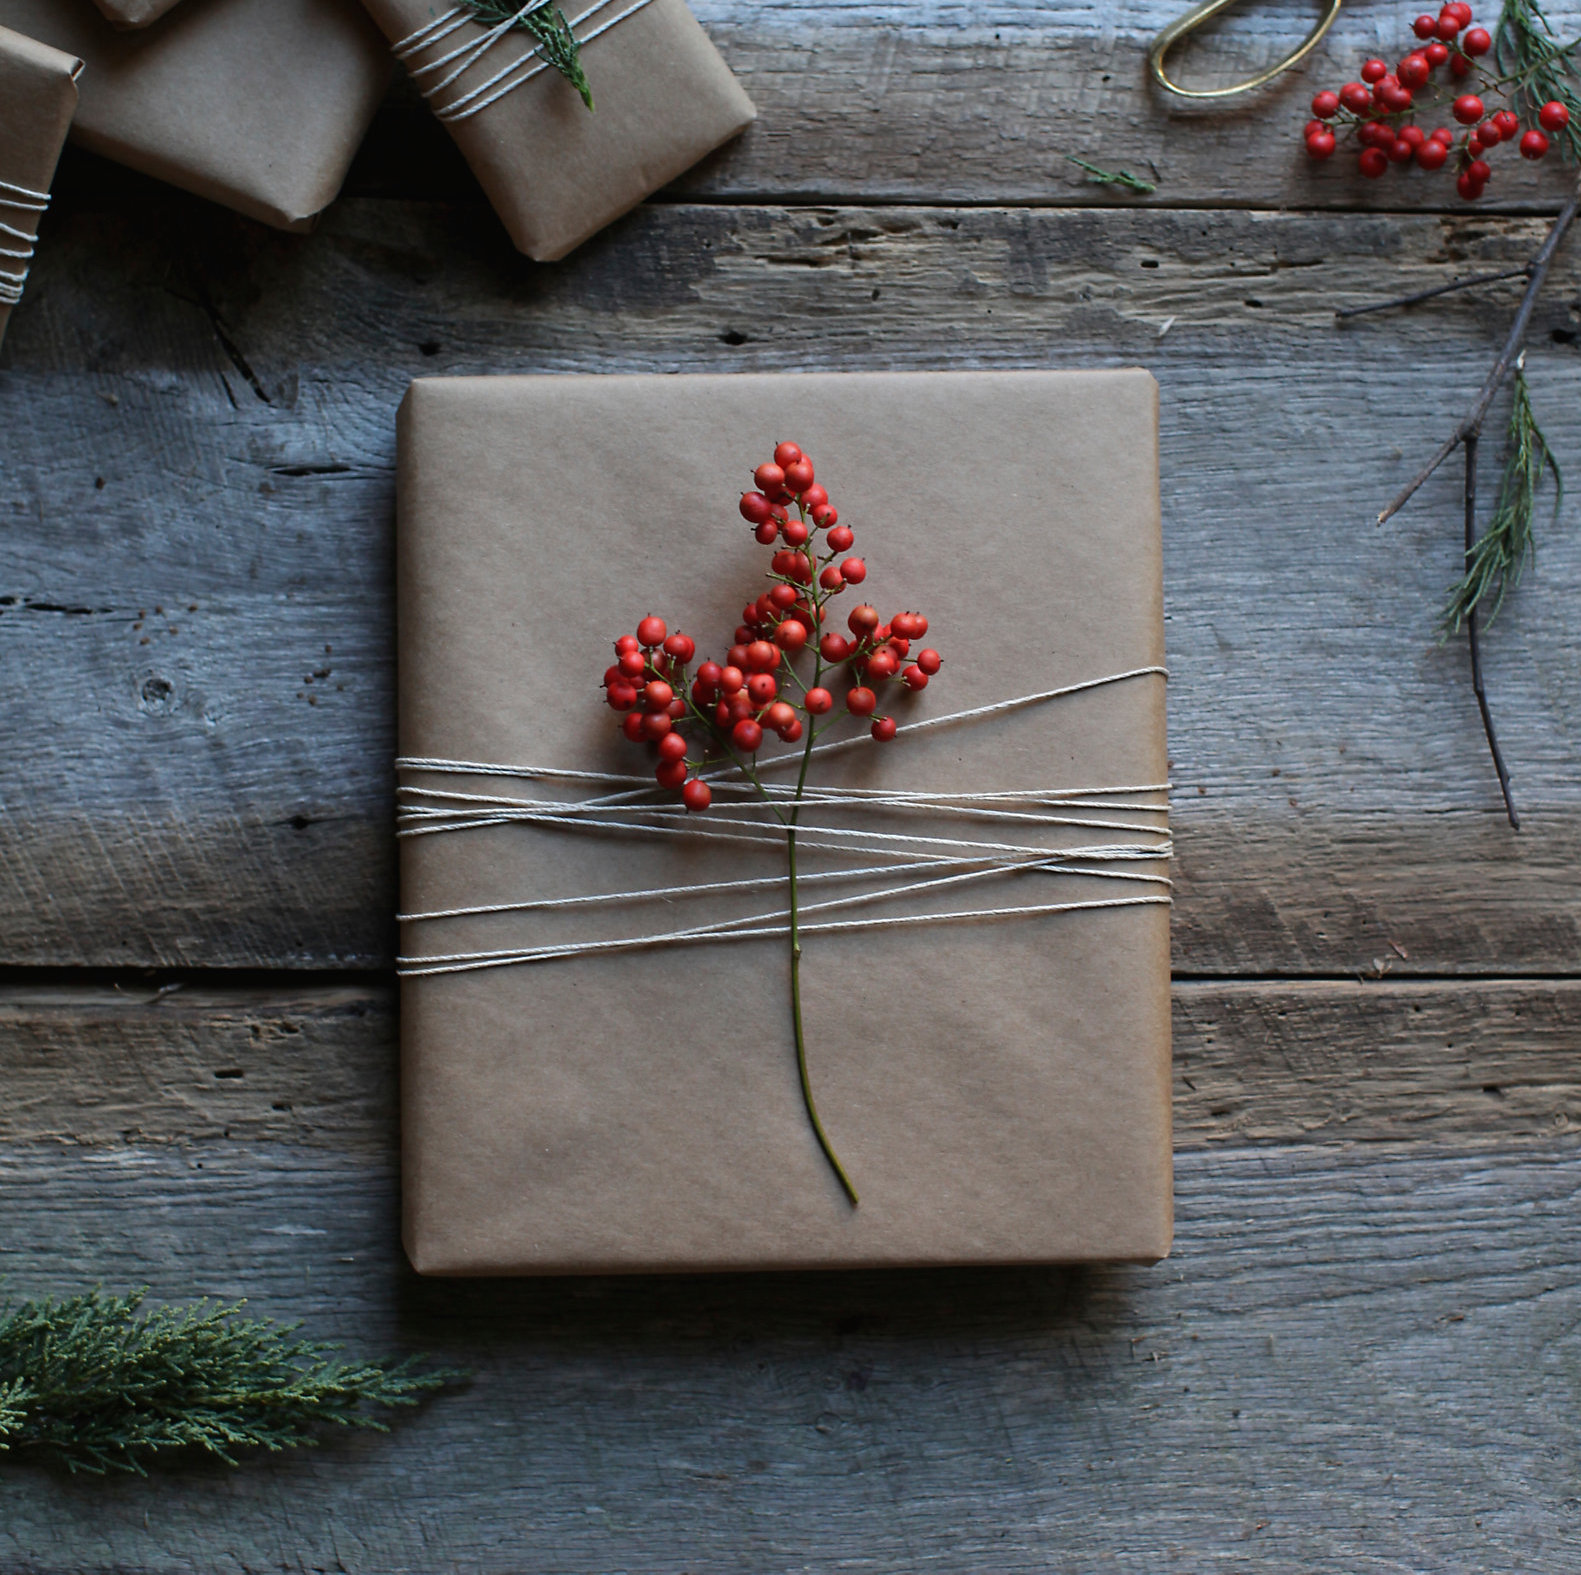 5 fashionable Christmas gift ideas